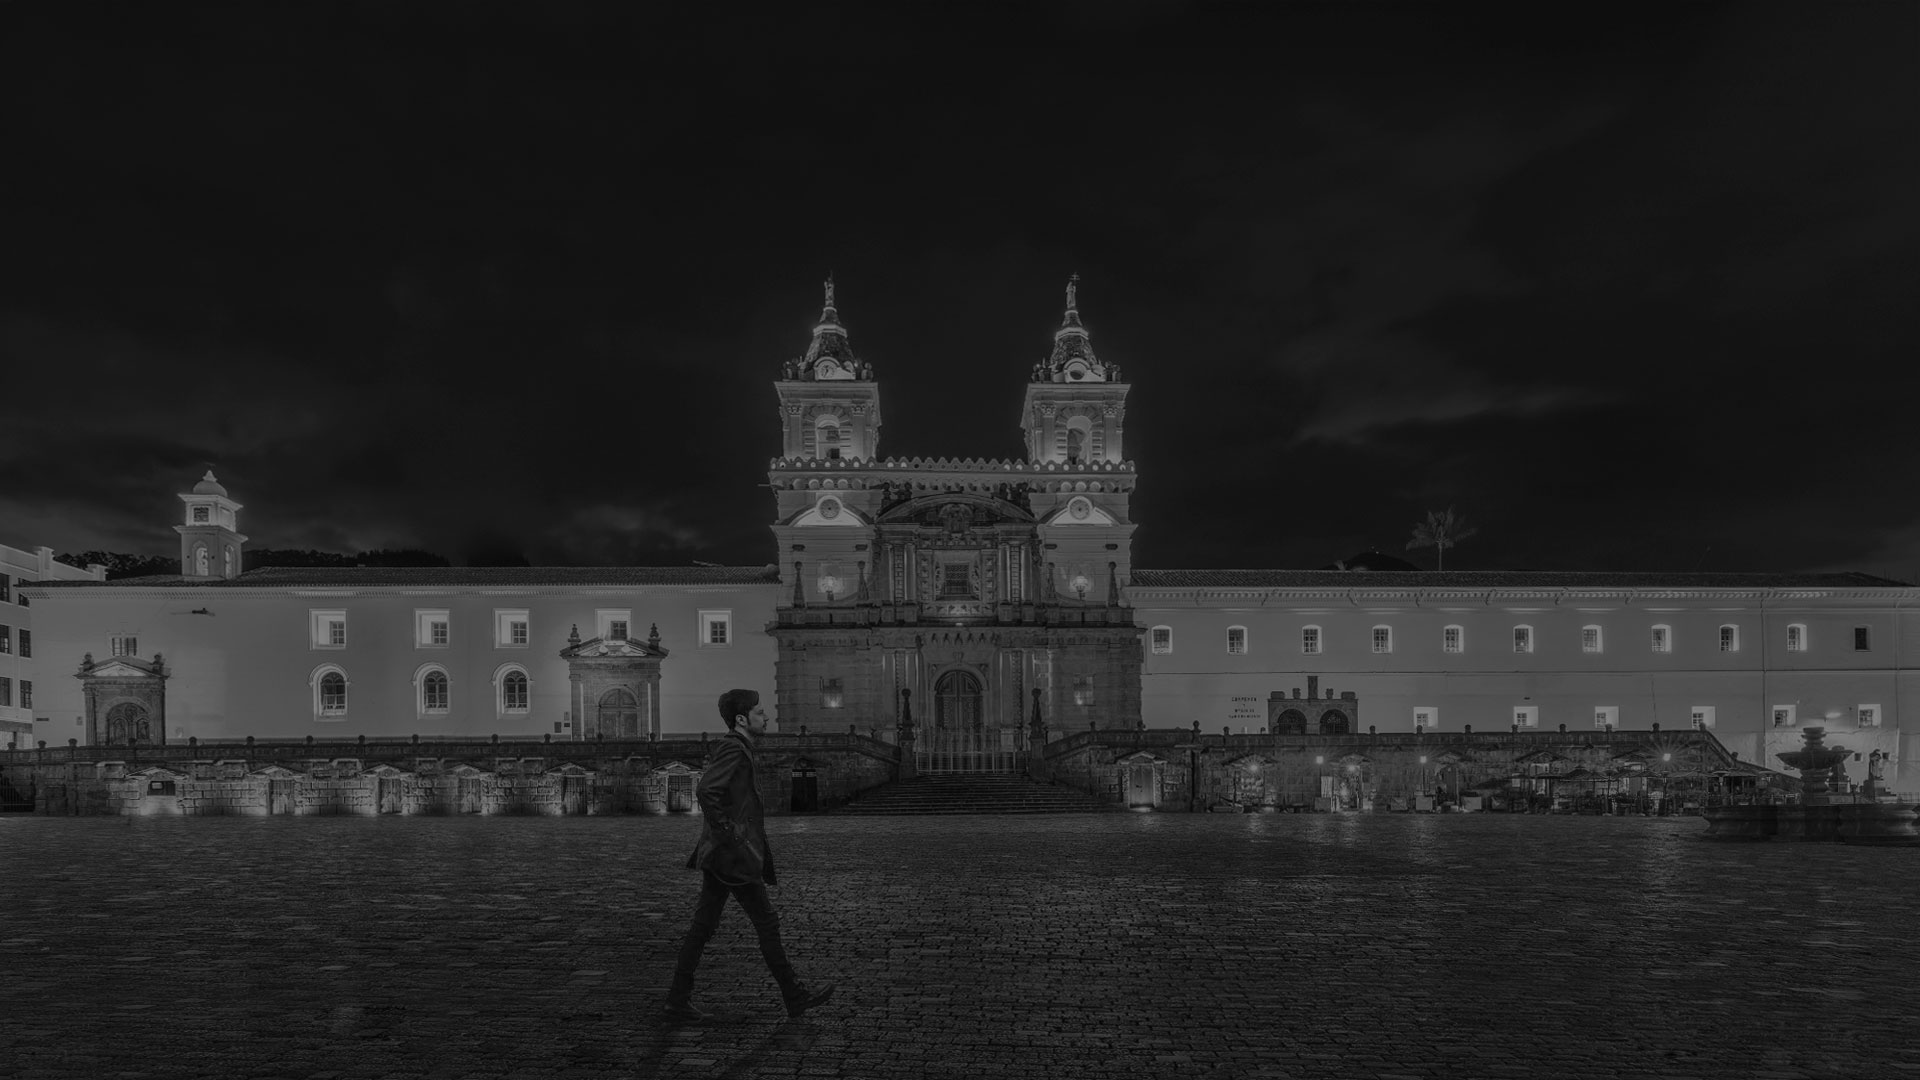 Vladimir Zambrano / Quito - Ecuador / Fotomontaje / Photo Manipulation